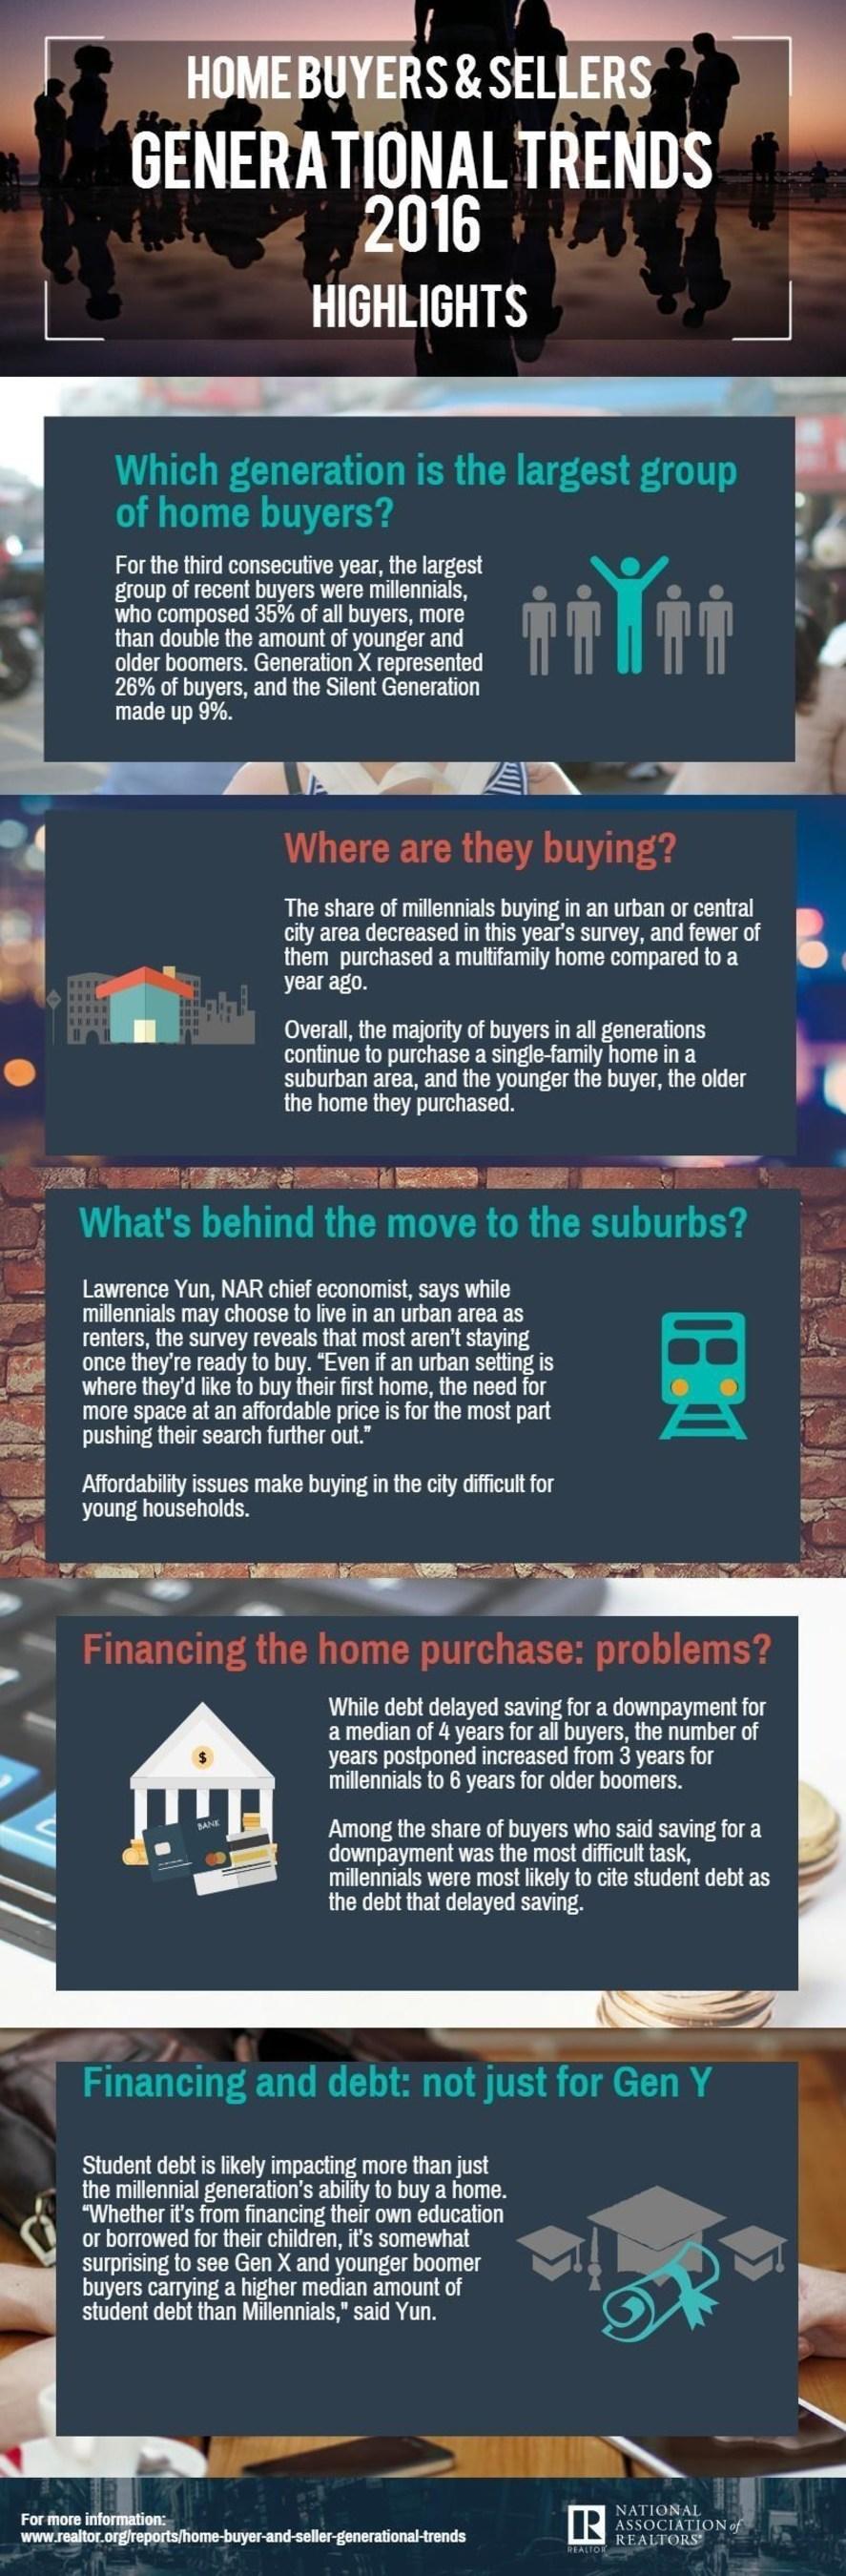 NAR Generational Survey: Millennials Increasingly Buying in Suburban Areas